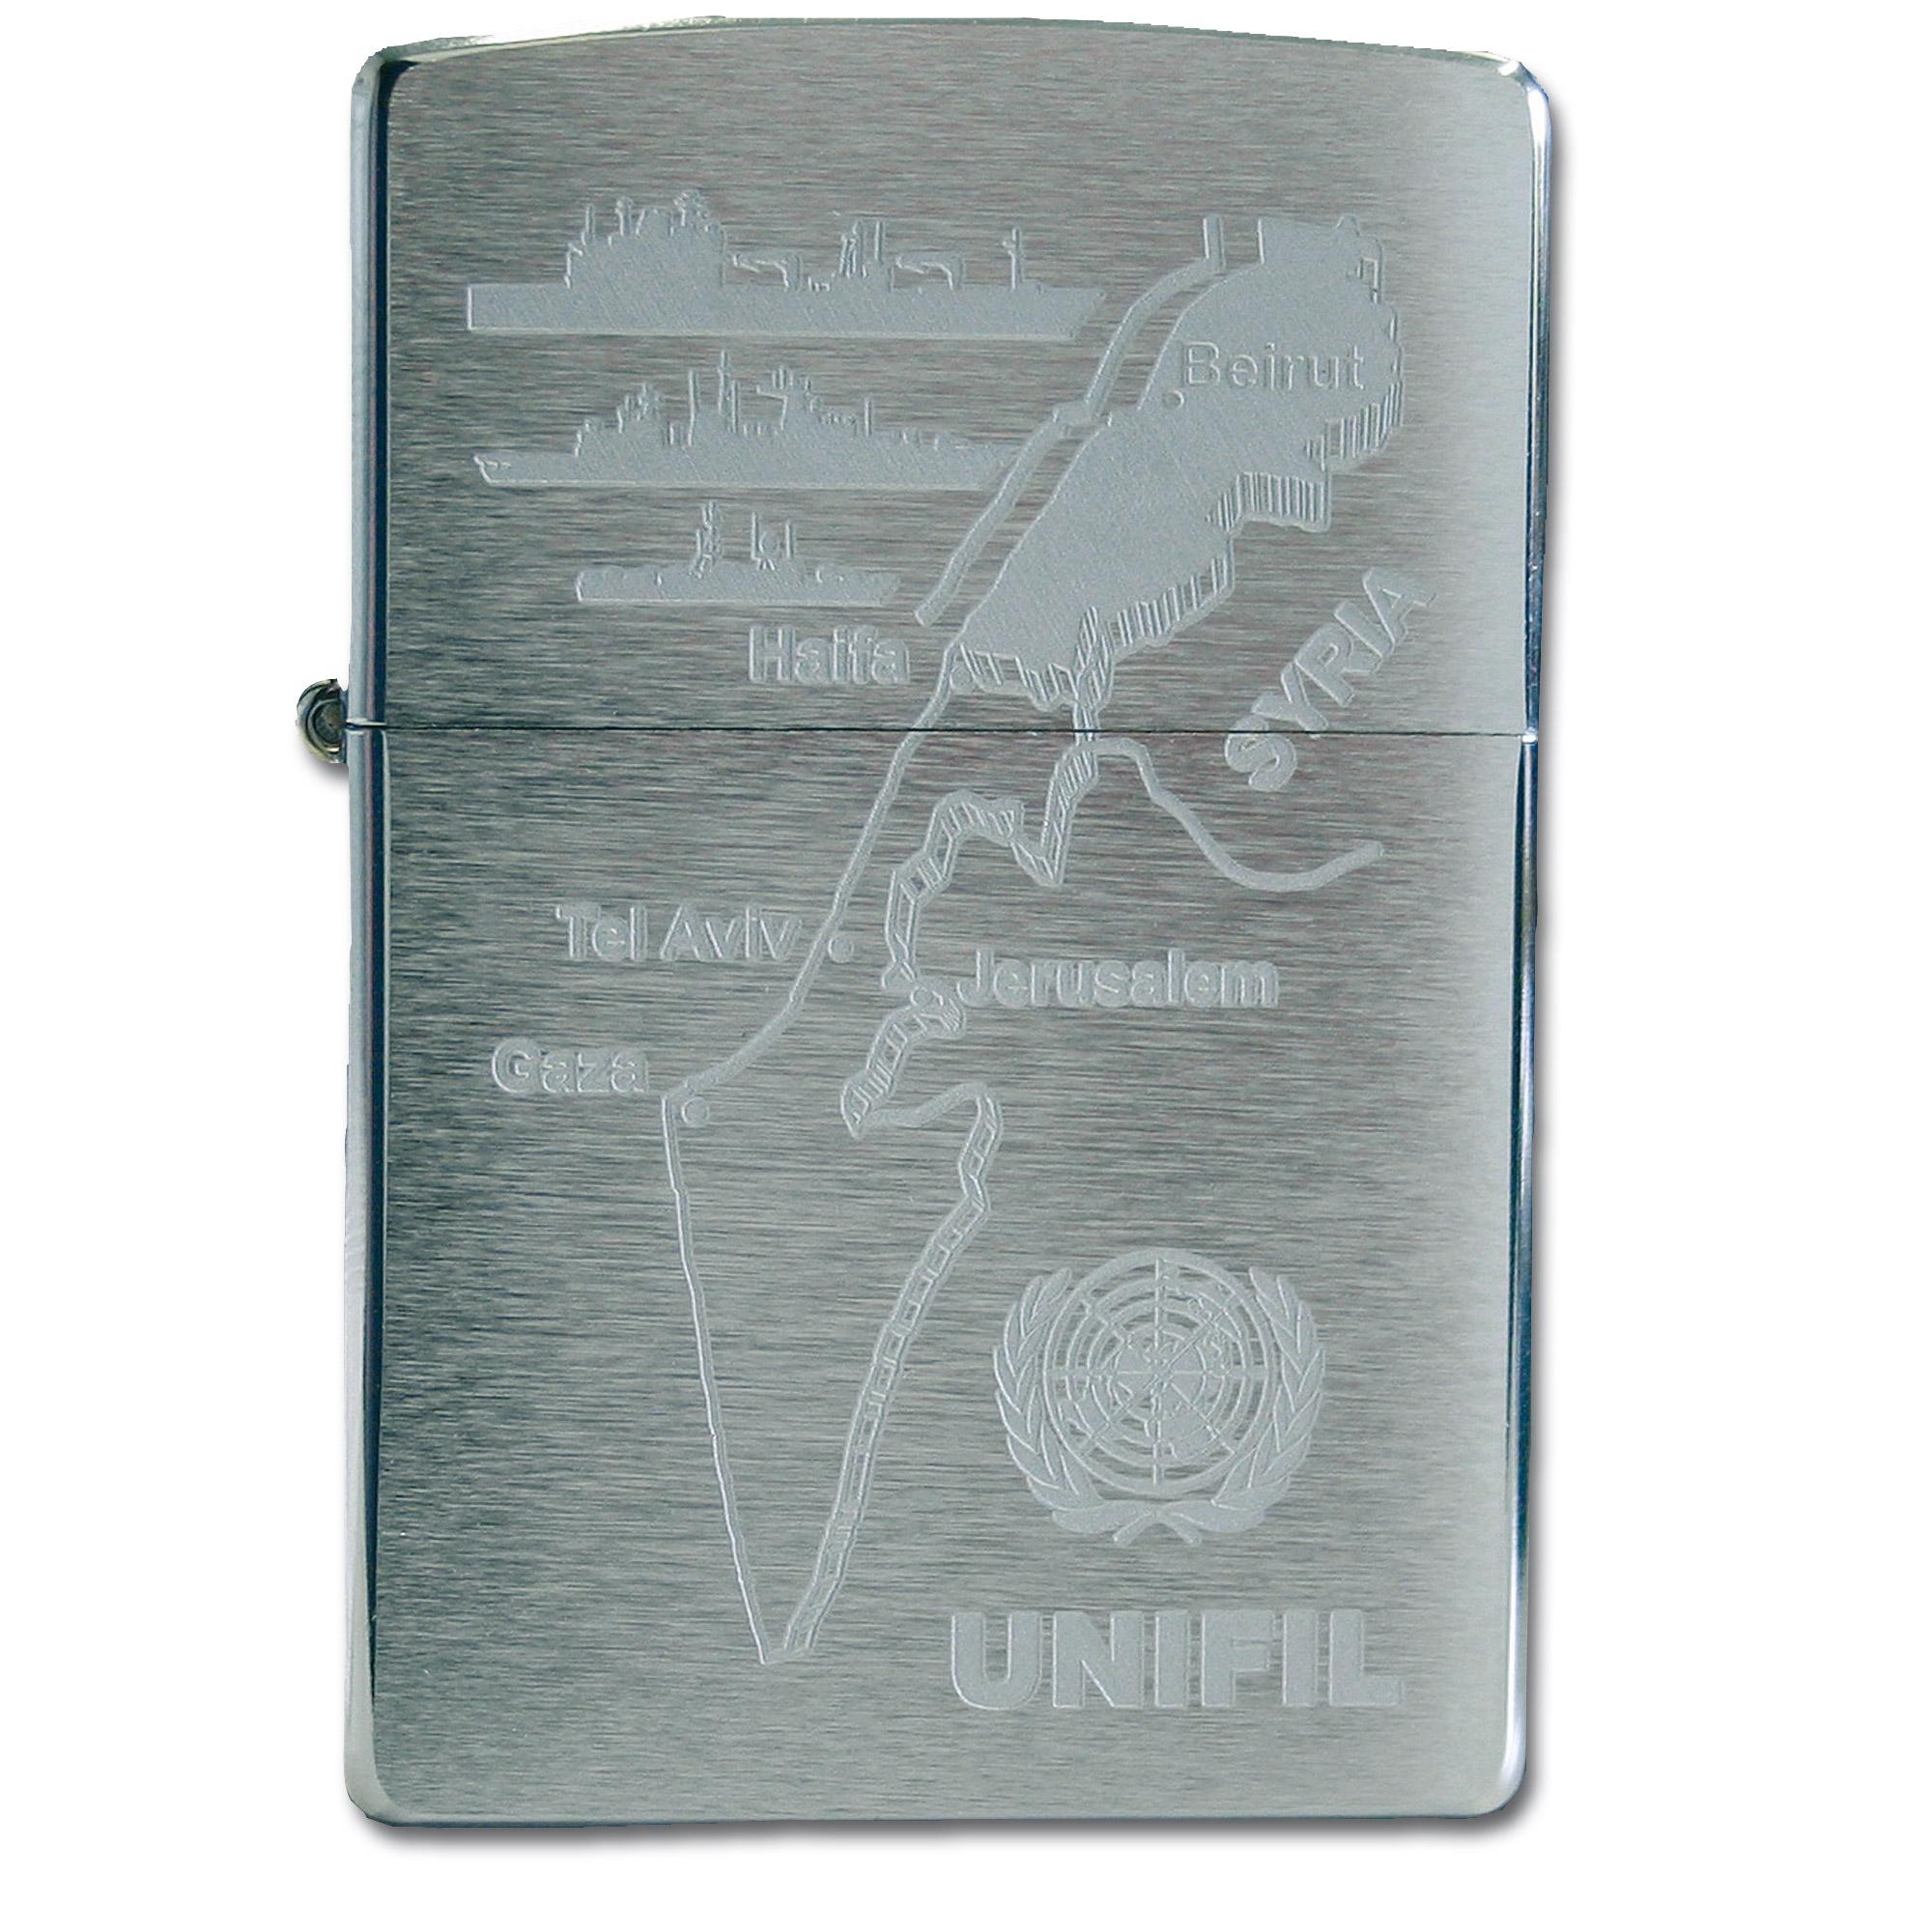 Zippo avec gravure UNIFIL